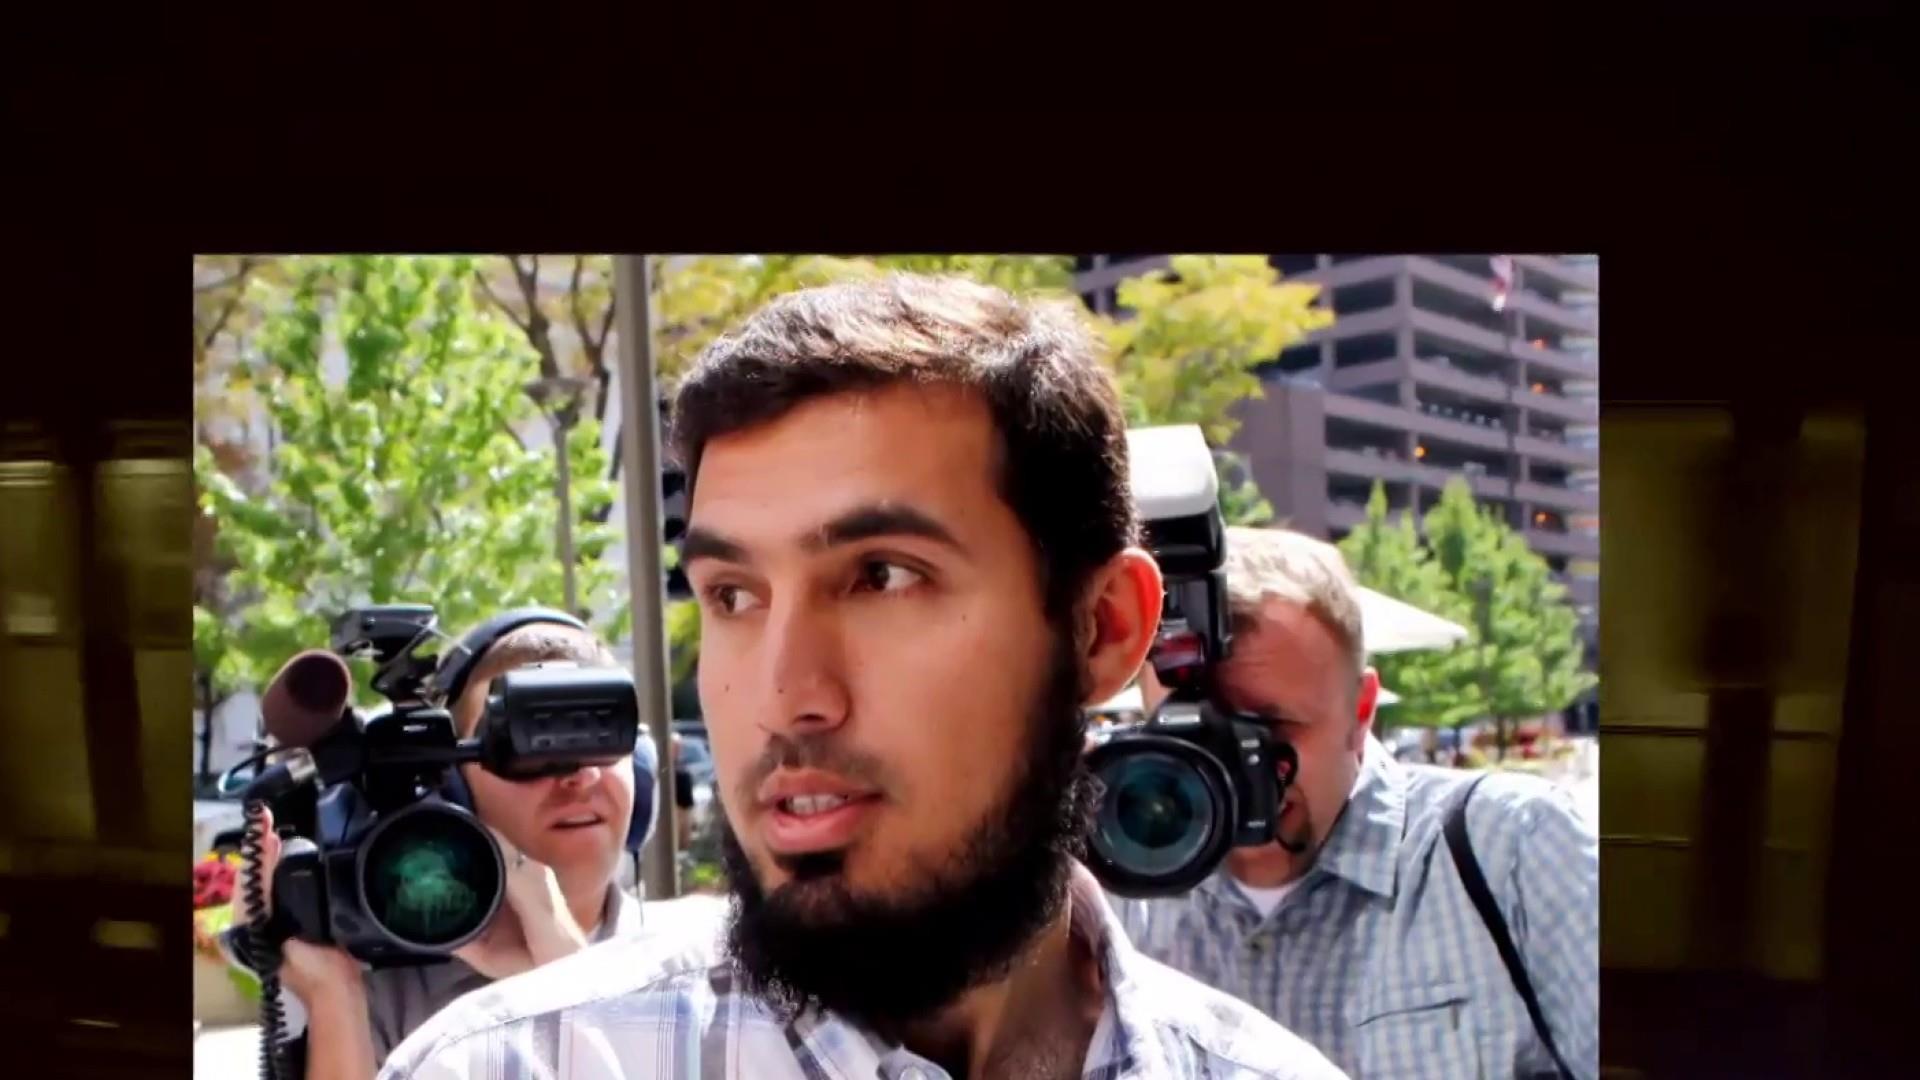 Ringleader in foiled NYC subway bombing plot may walk free